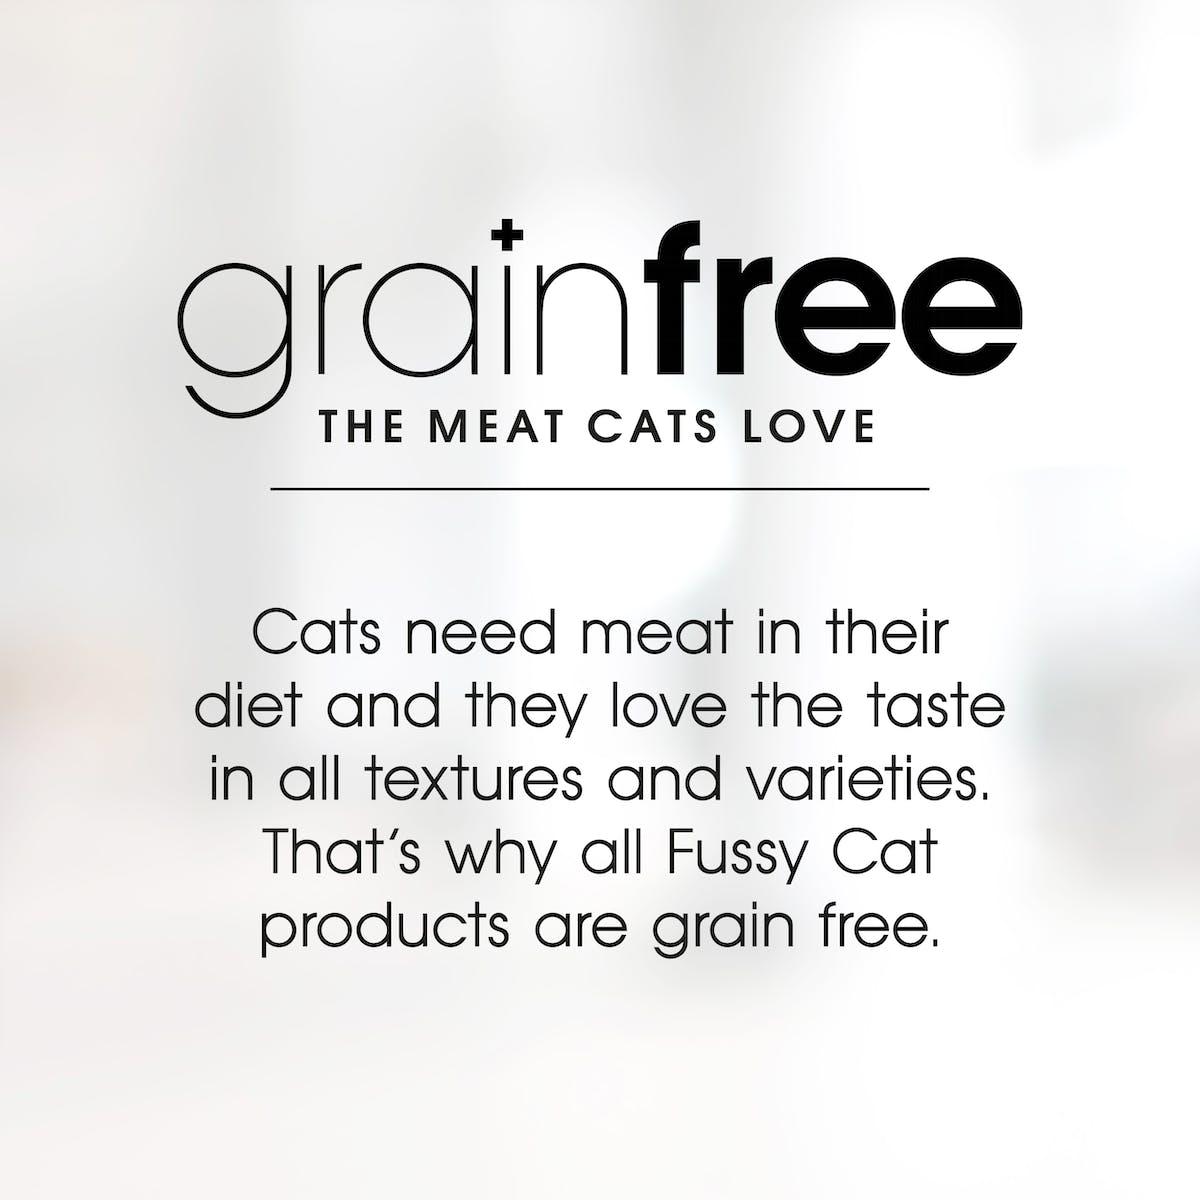 Fussy Cat | Bites & Gravy Favourites | Wet Cat Food